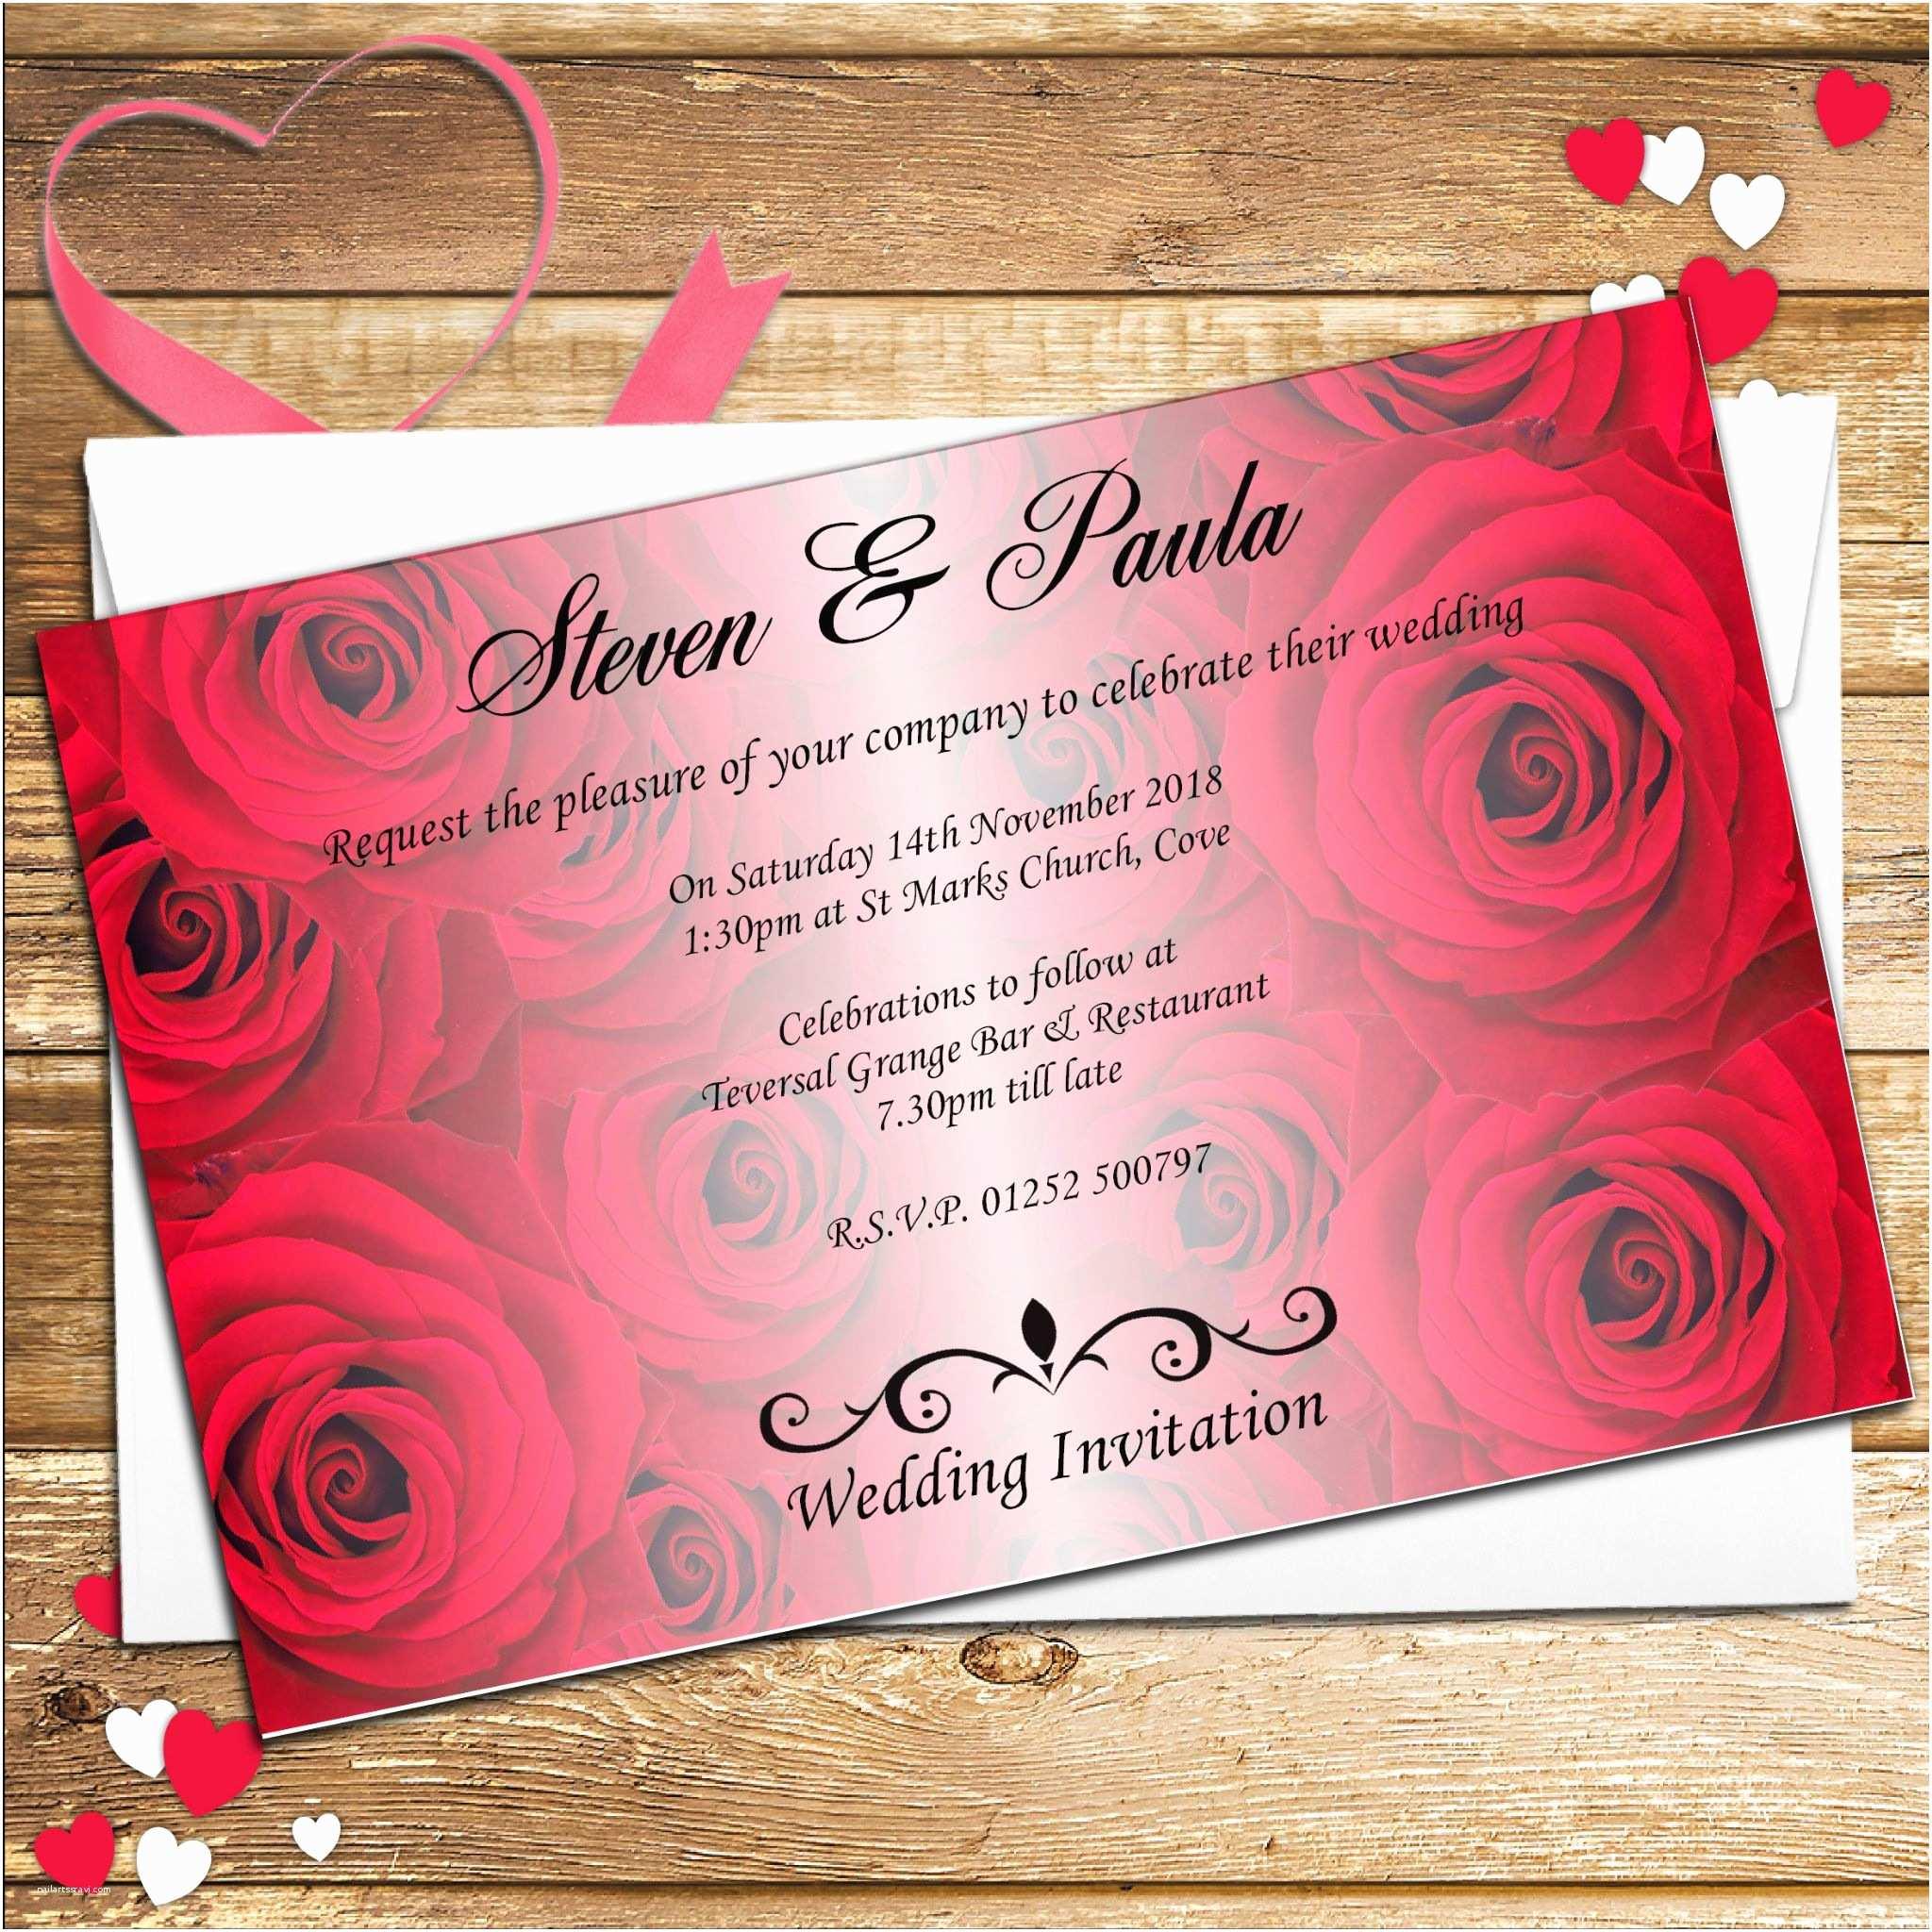 Rose Wedding Invitations 10 Personalised Red Roses Wedding Invitations Day Evening